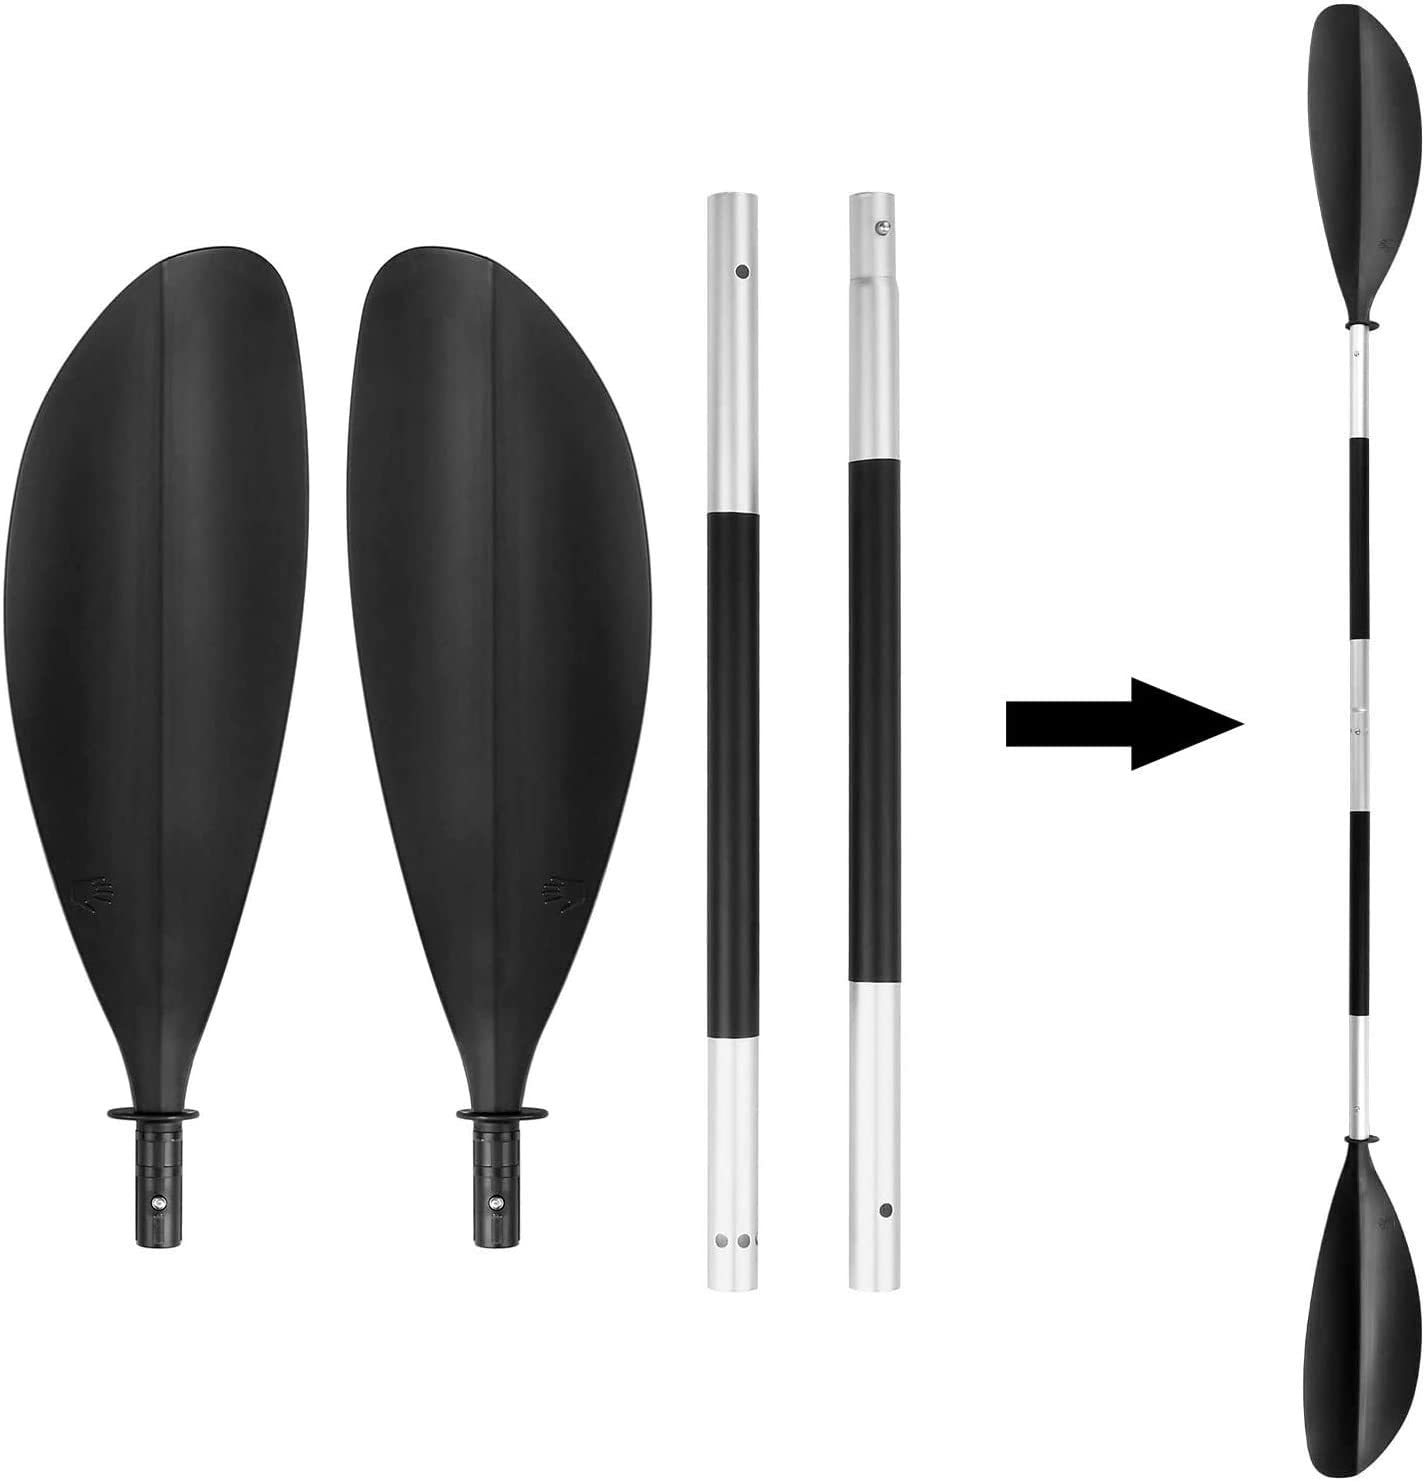 Pink Blade Kayak Paddle Carbon Fiber Shaft